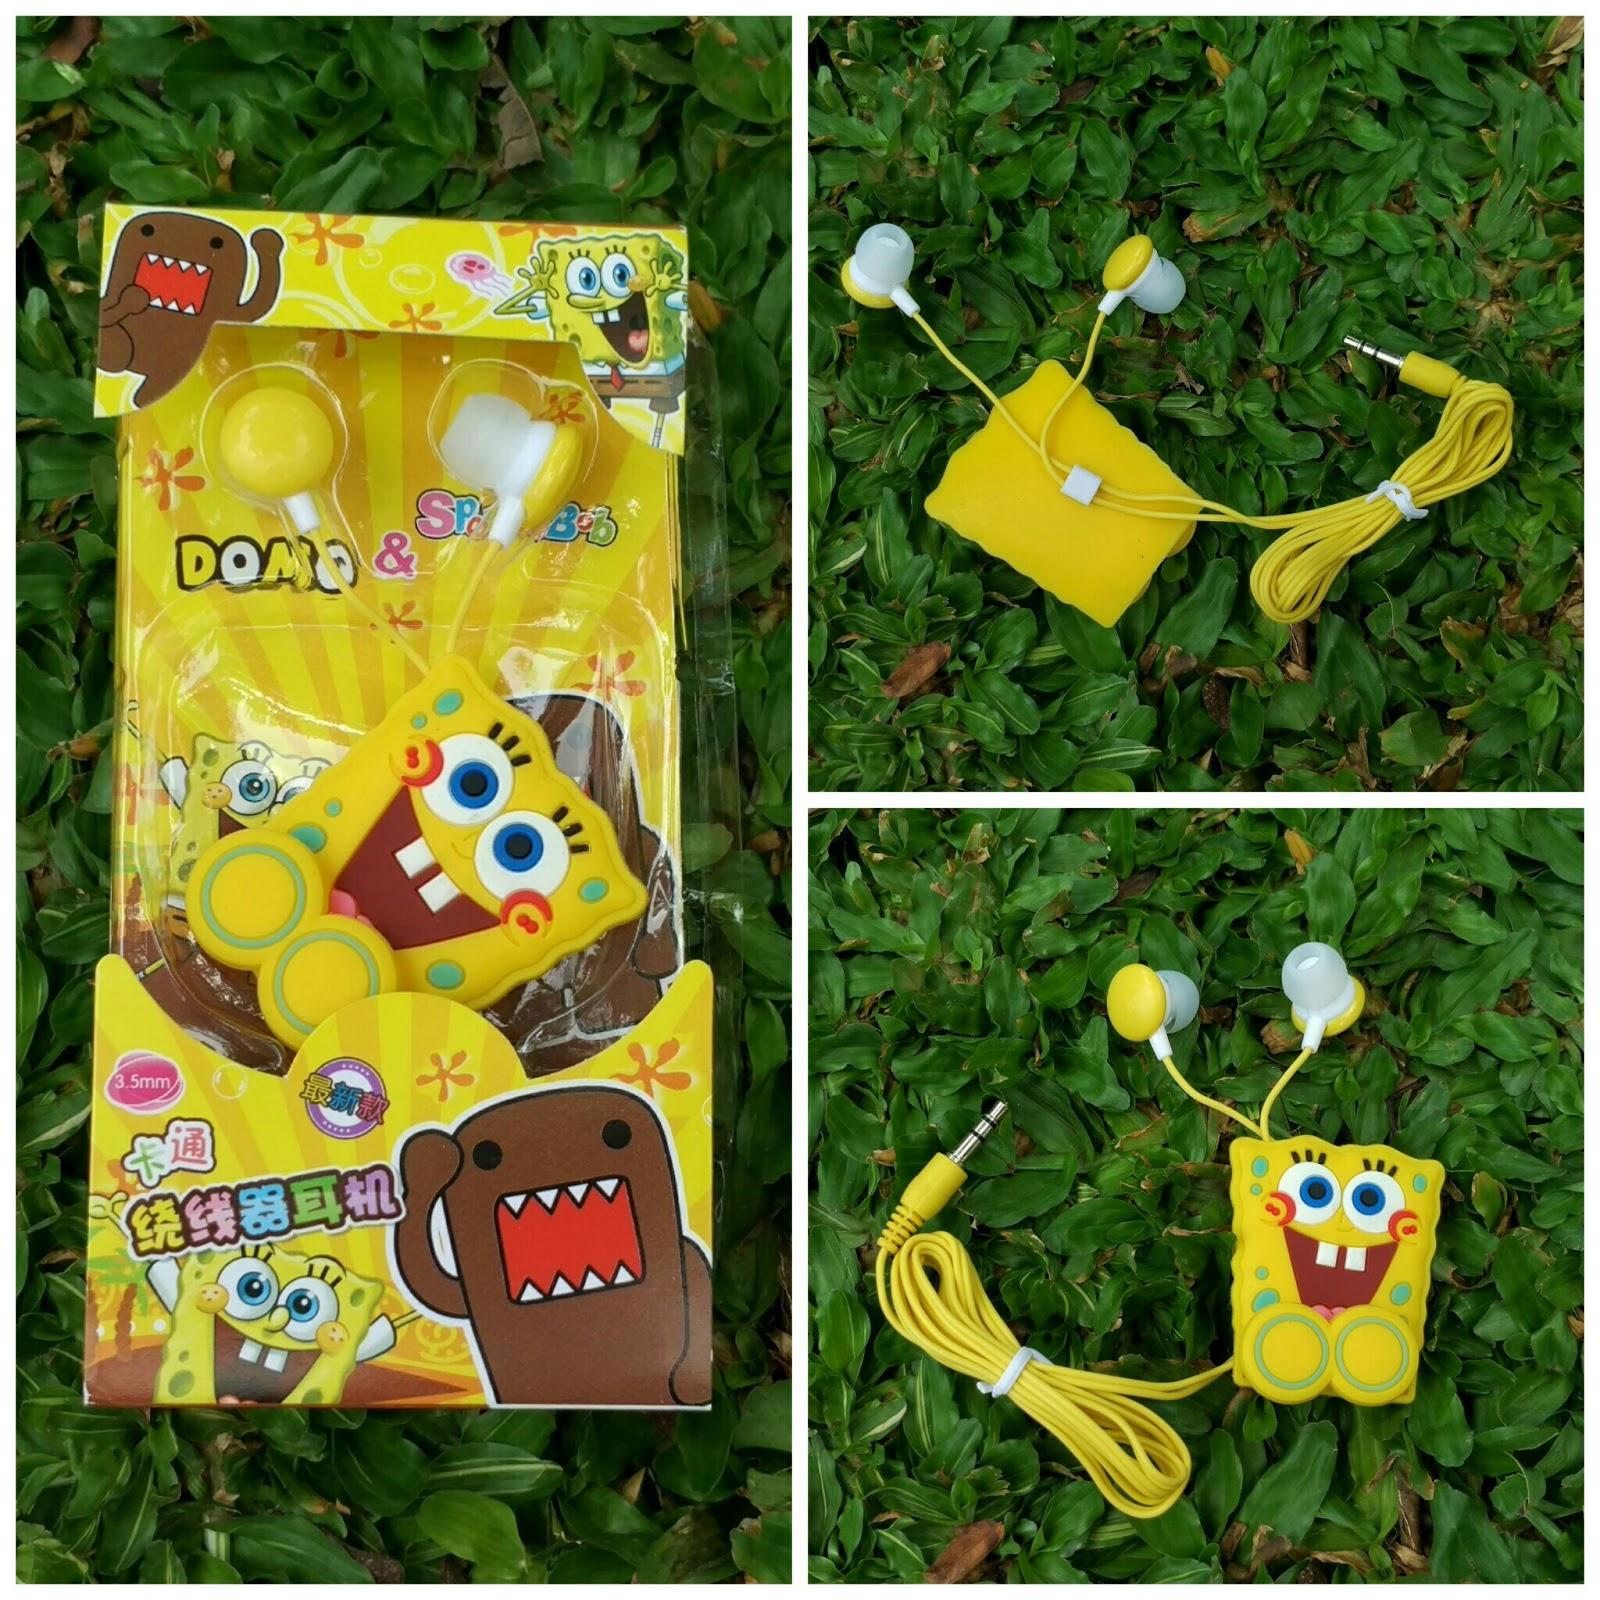 Headset Spongebob, aksesoris handphone; aksesoris hp, earphone spongebob, aksesoris smartphone, pernak pernik spongebob, spongebob collections, koleksi spongebob